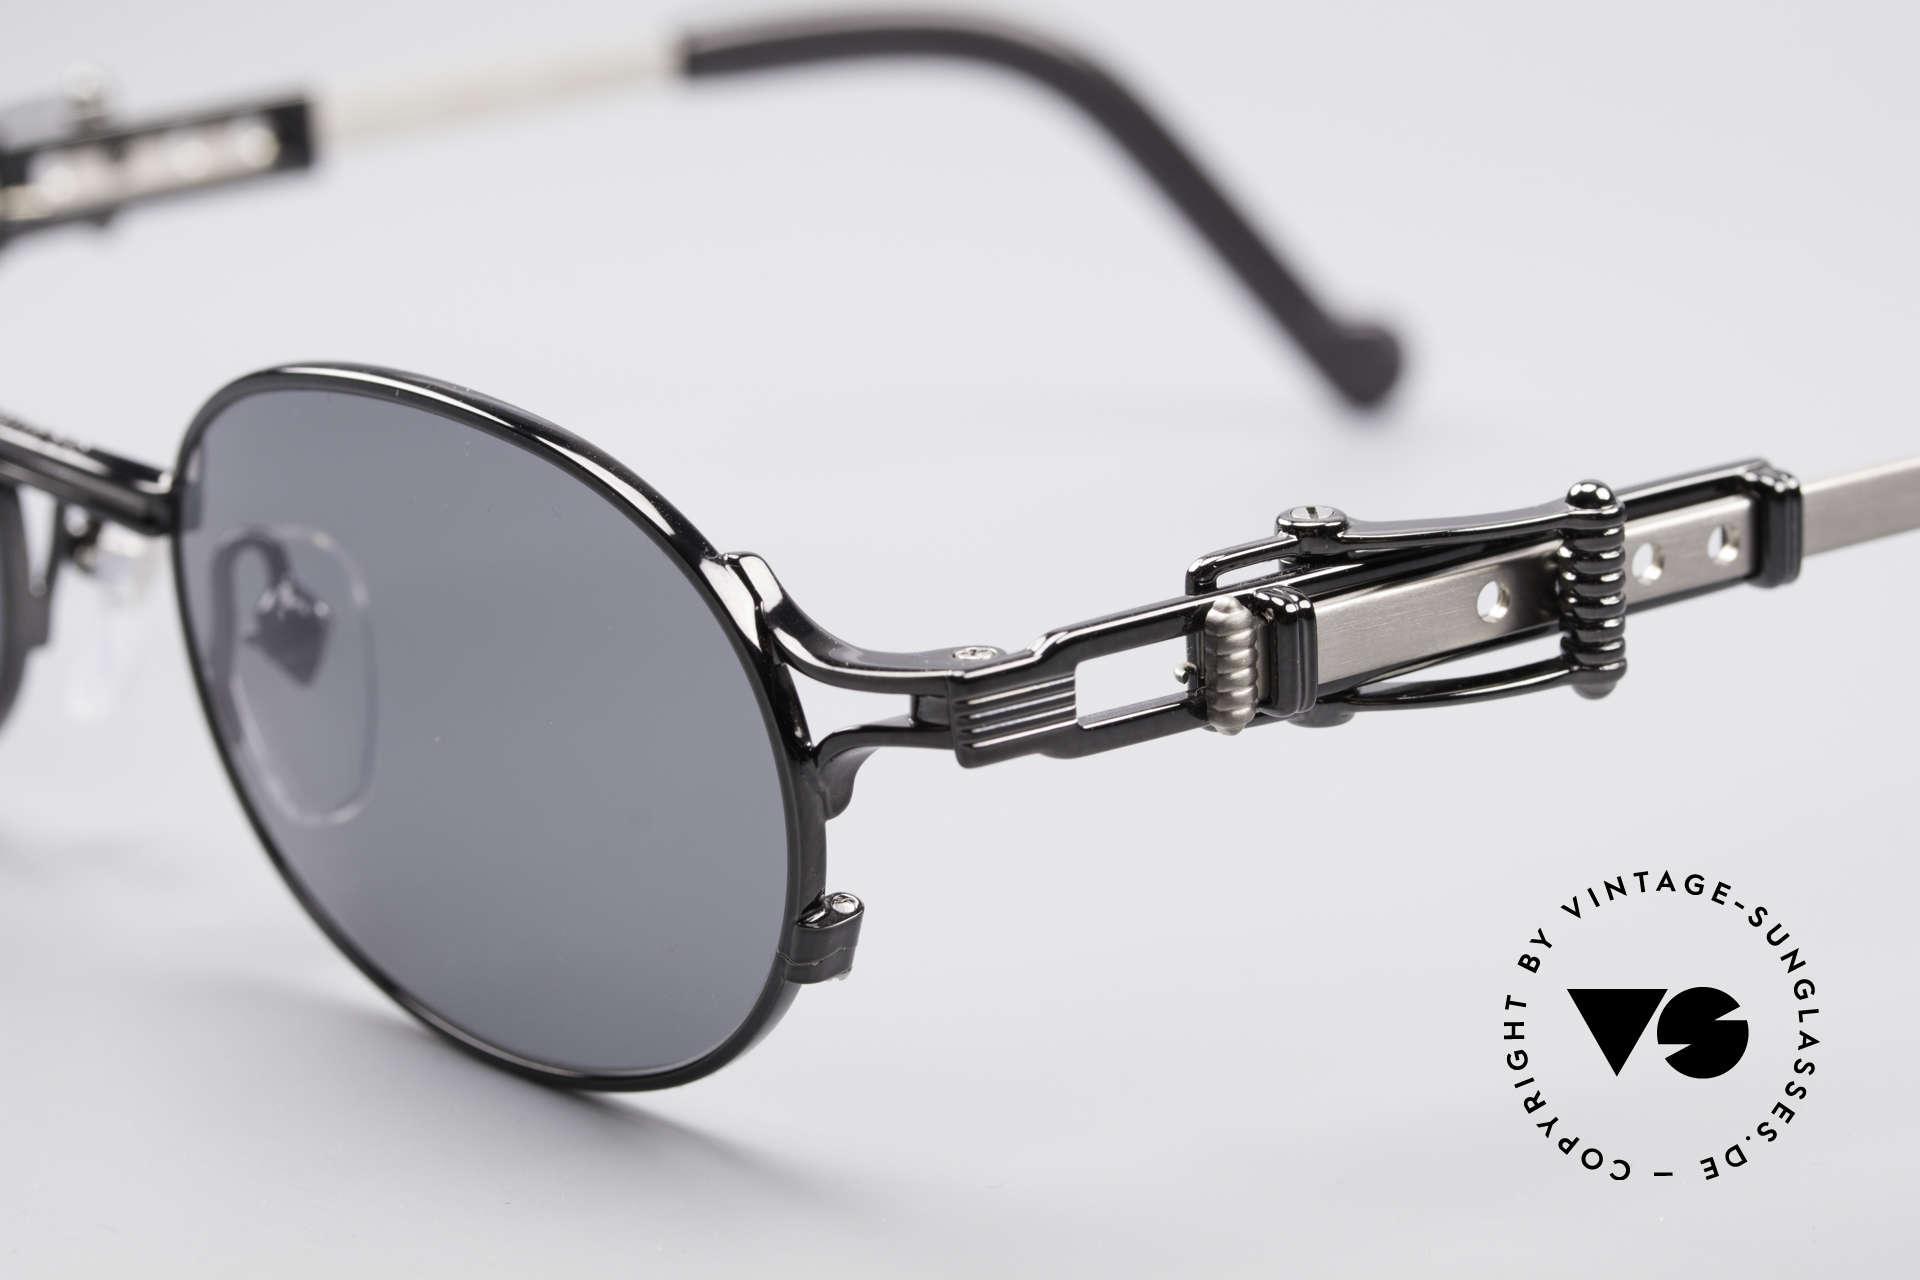 Jean Paul Gaultier 56-0020 Oval Belt Buckle Frame, unworn designer piece (precious, rare, treasured), Made for Men